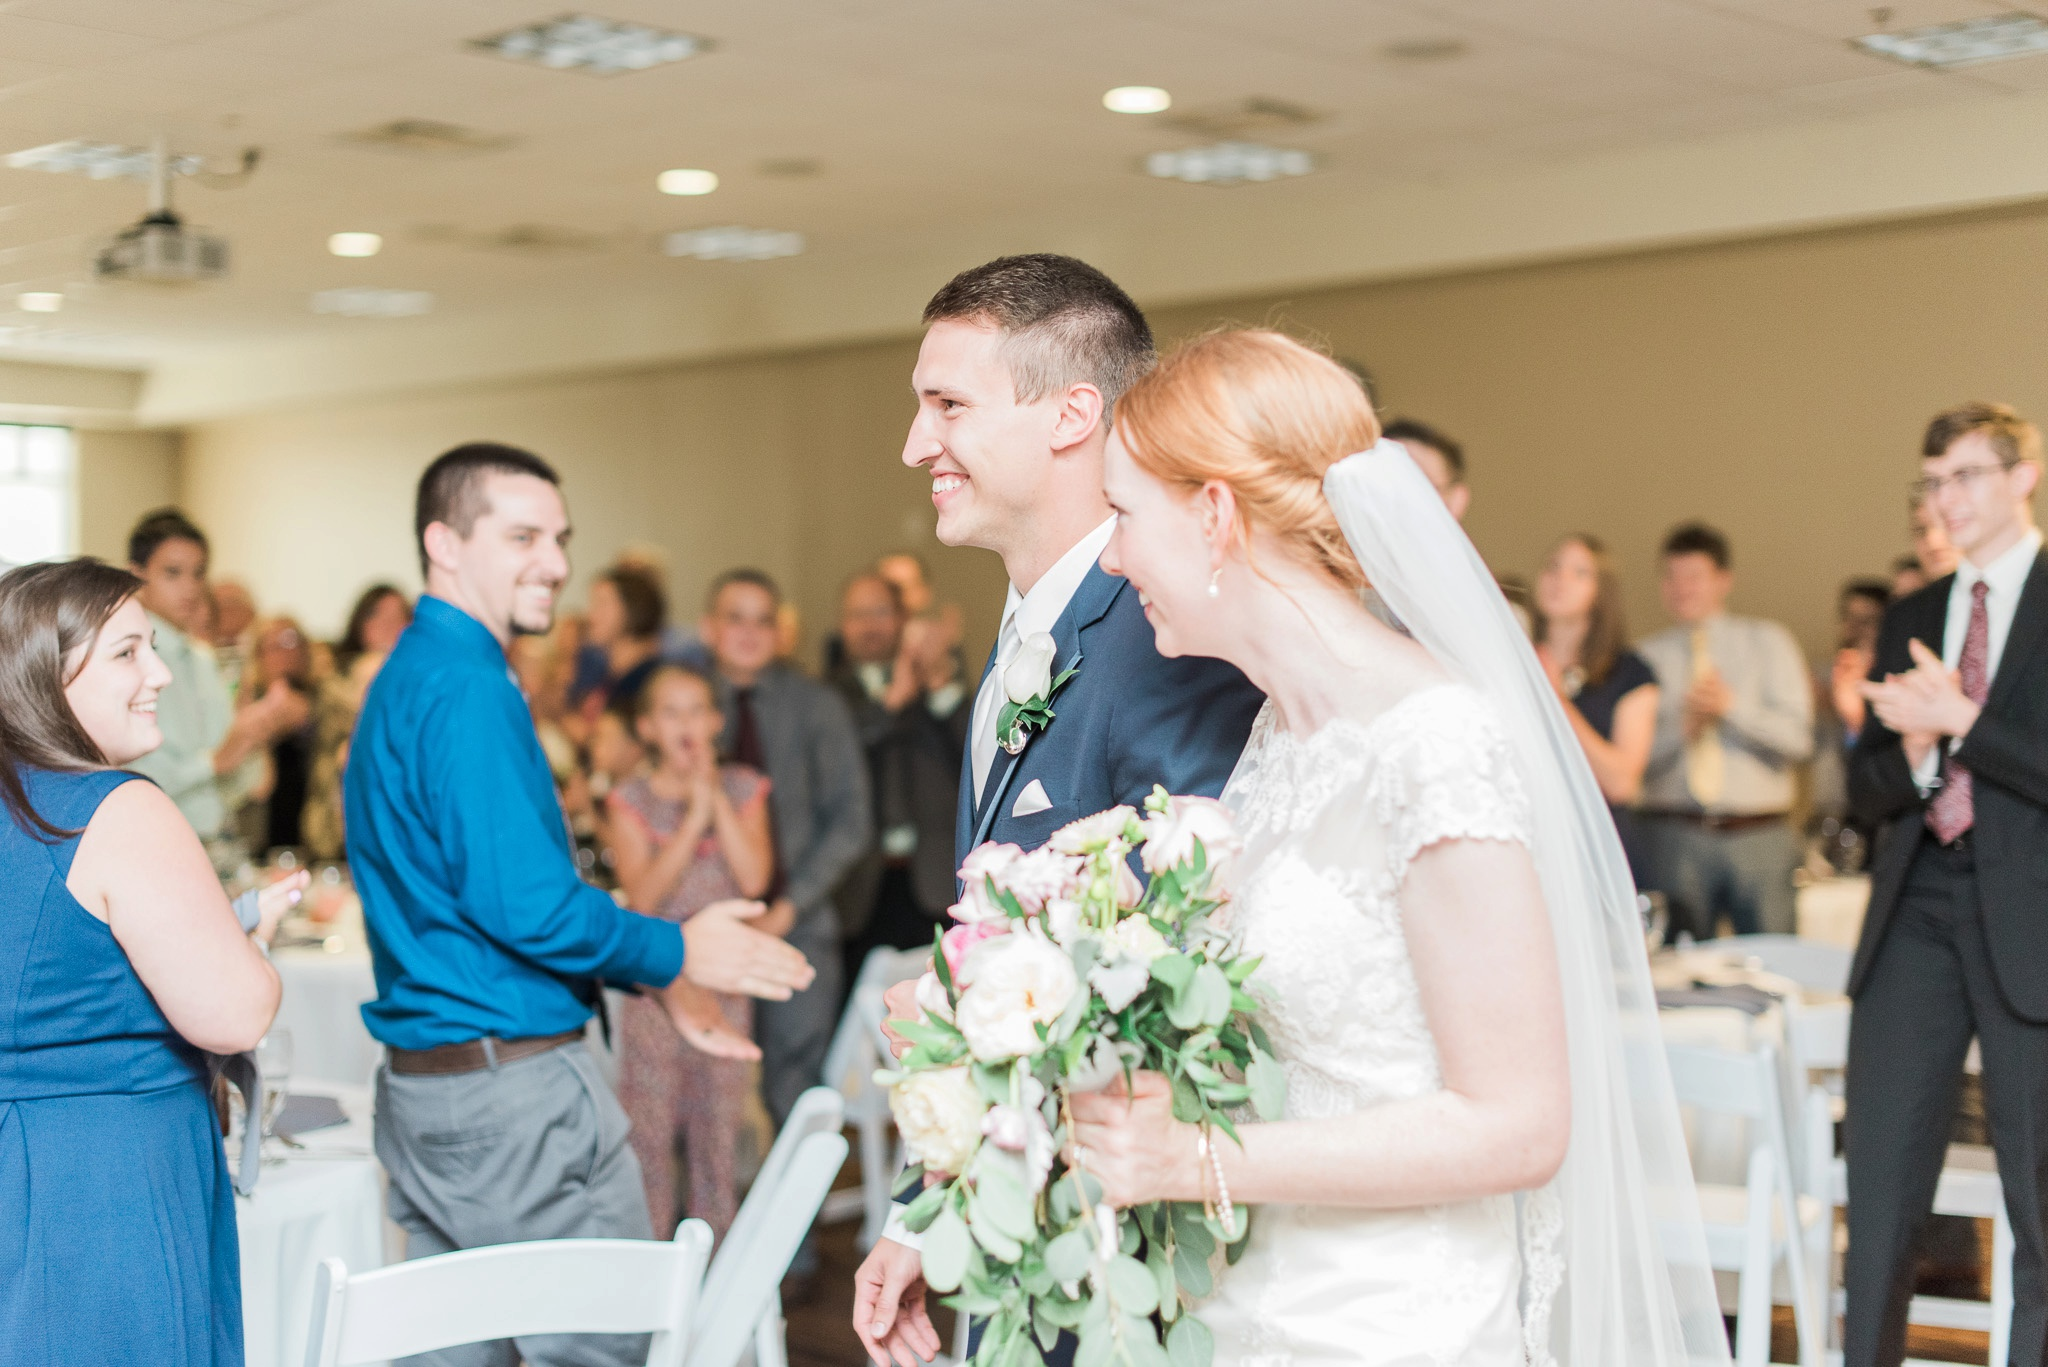 sunbury-ohio-wedding-hannah-johnathan_0115.jpg